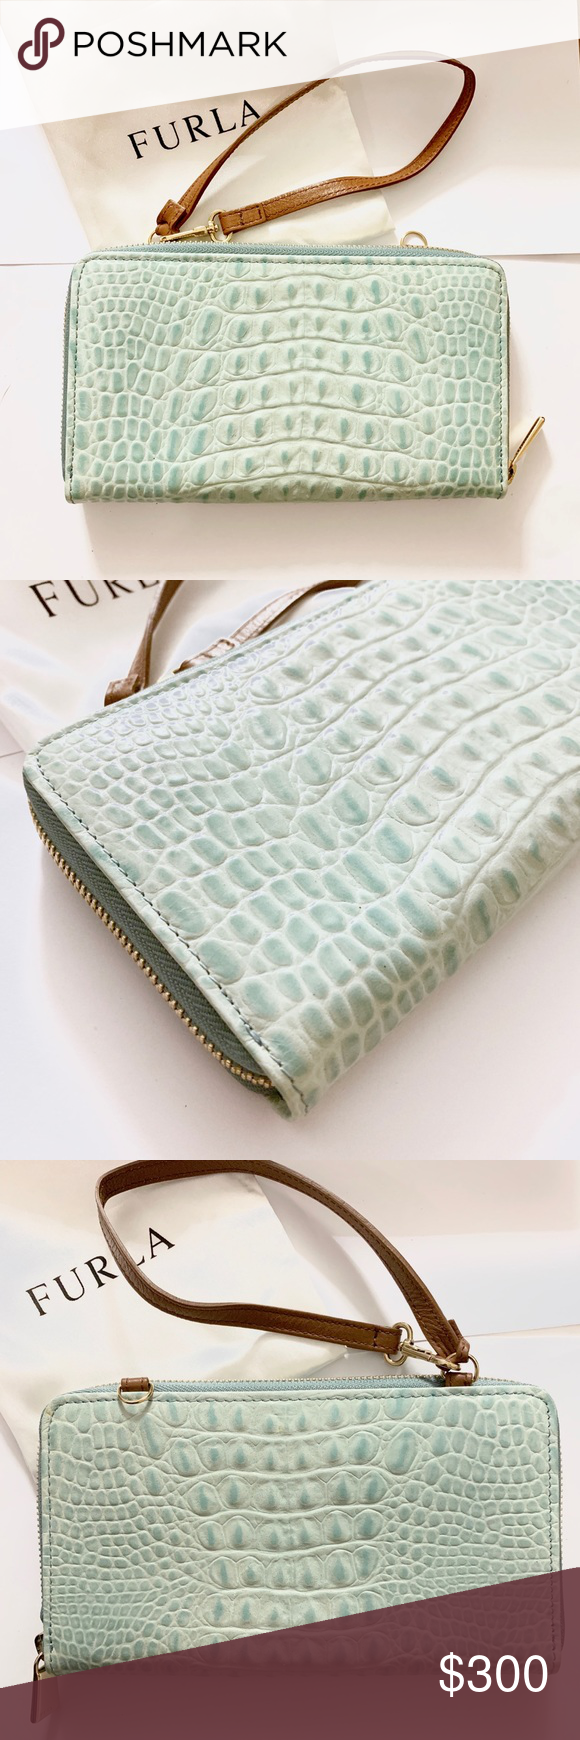 Sale Furla Crocodile Embossed Leather Wallet Leather Wallet Embossed Leather Furla Bags